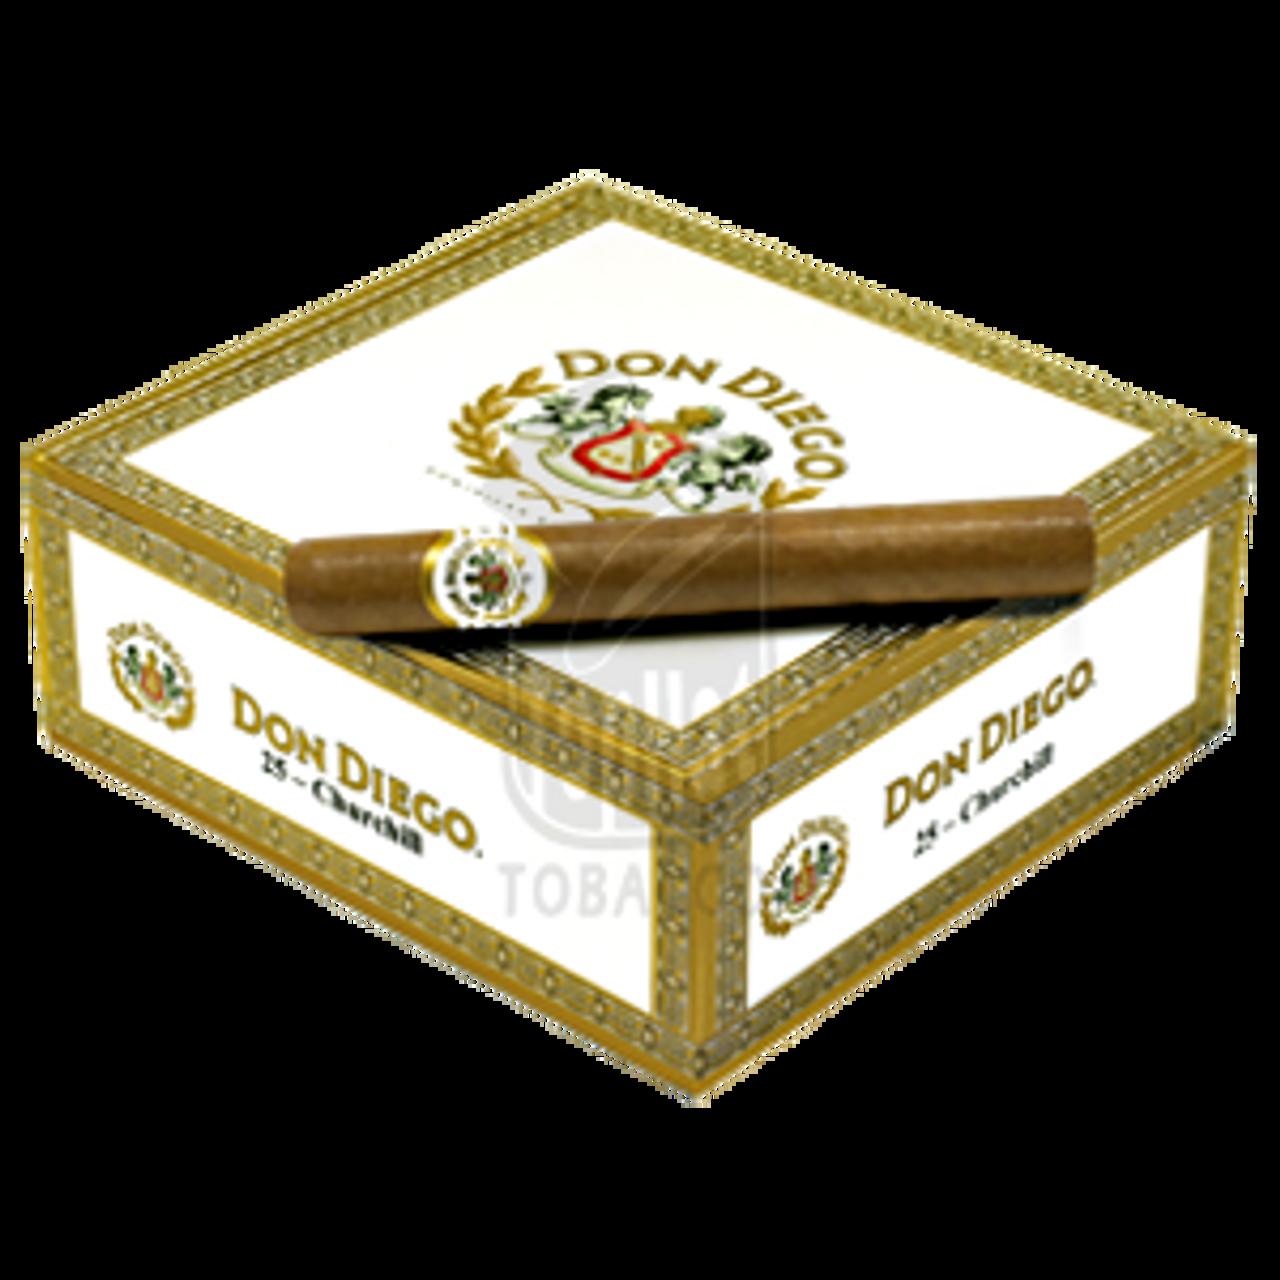 Don Diego Churchill Cigars - 7 x 54 (Box of 25)